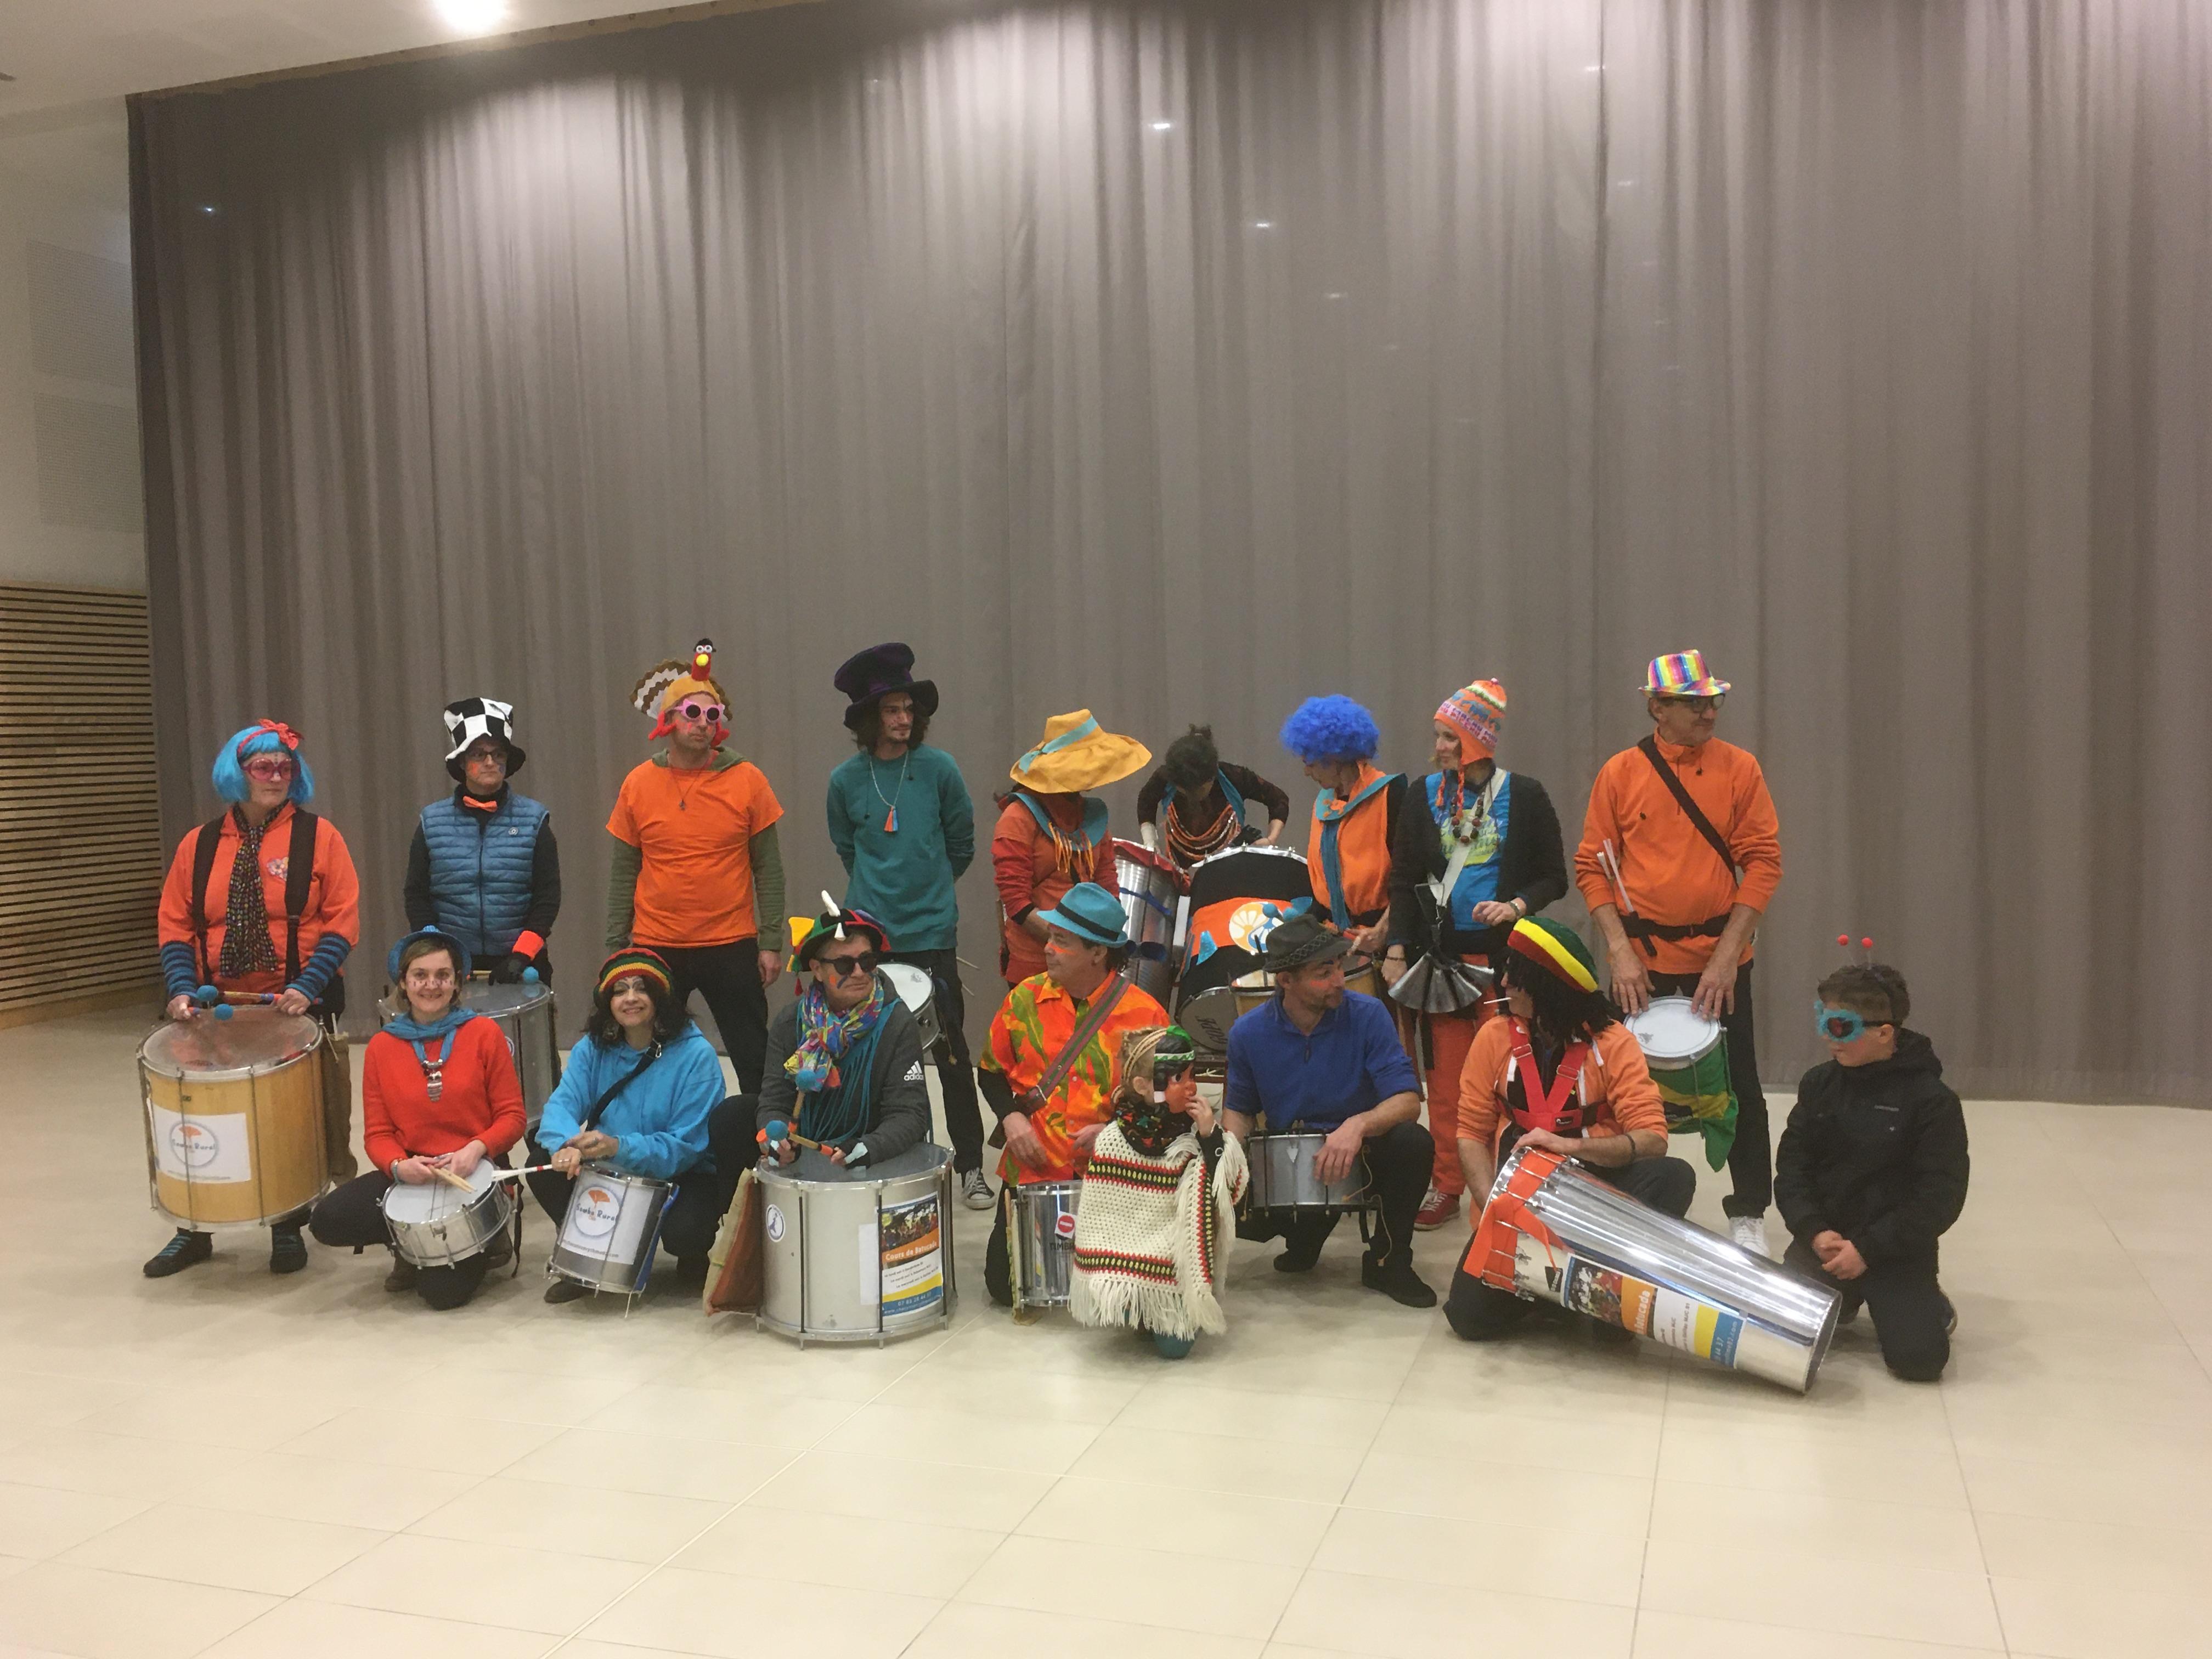 Carnaval de Roquette